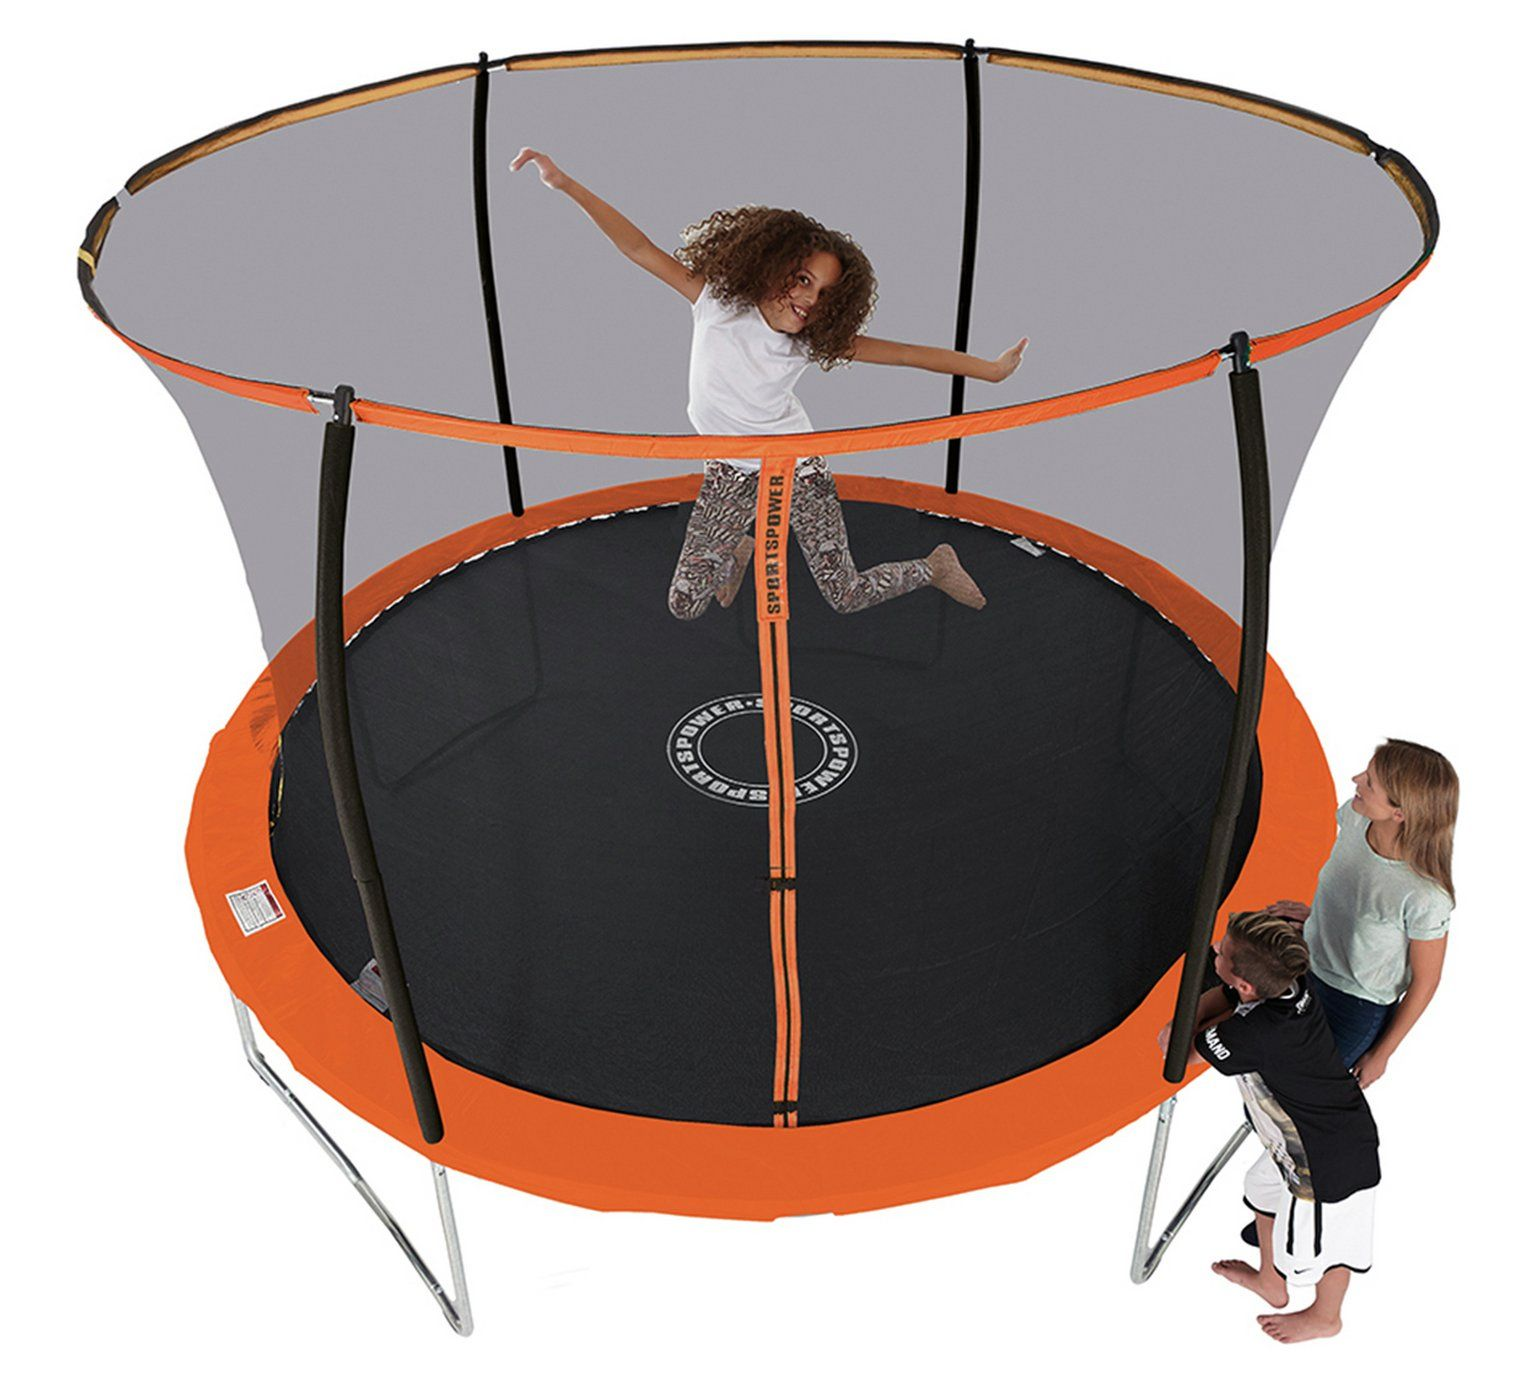 Buy Sportspower 8ft Trampoline With Folding Enclosure At Argos Co Uk Visit Argos Co Uk To Shop Online For Trampo 8ft Trampoline Backyard Trampoline Trampoline